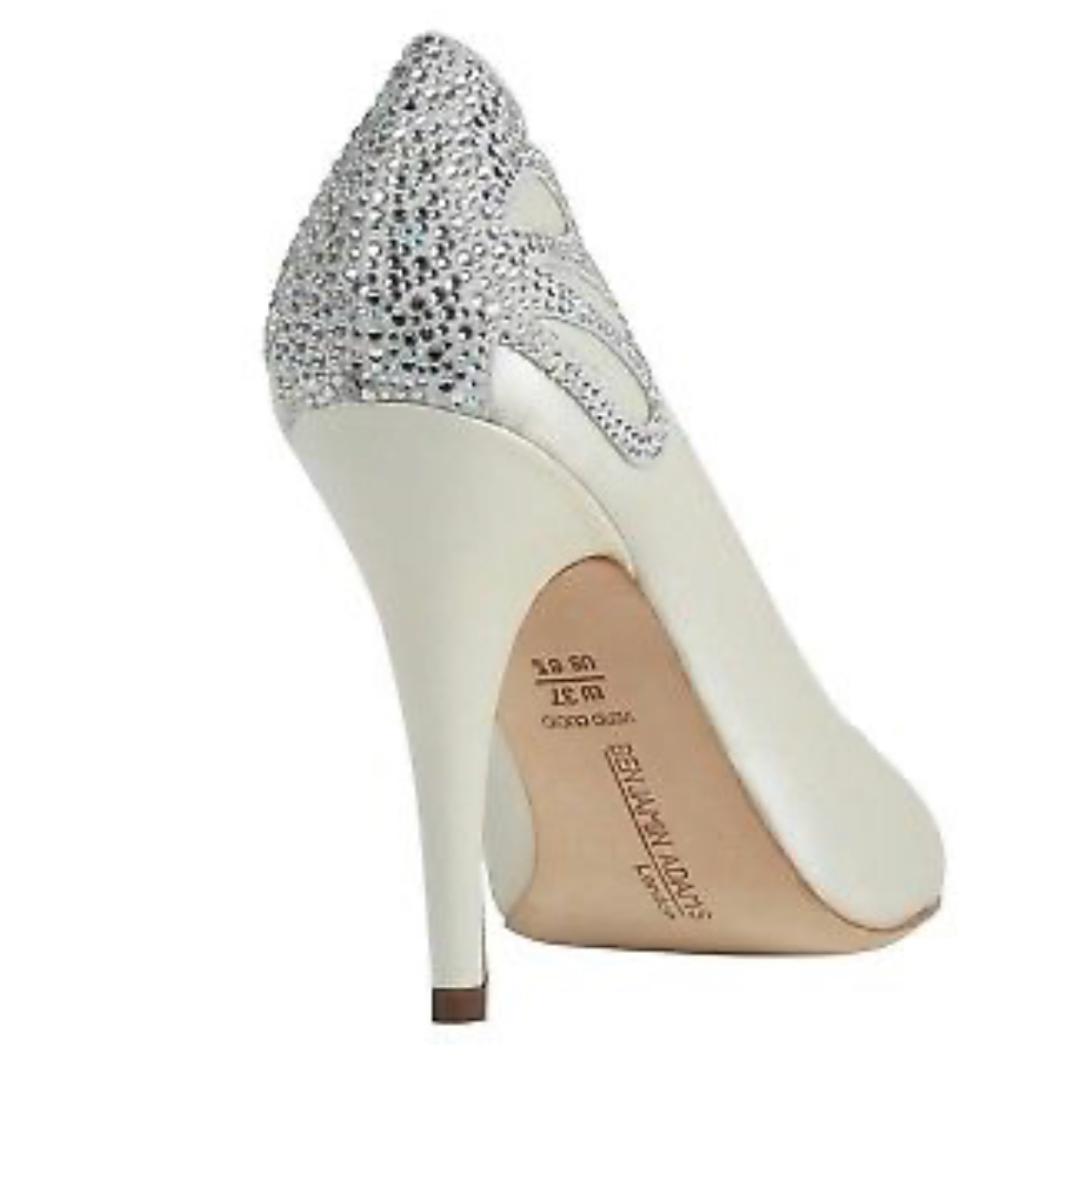 "Benjamin Adams 'Holford"" Shoe 2"